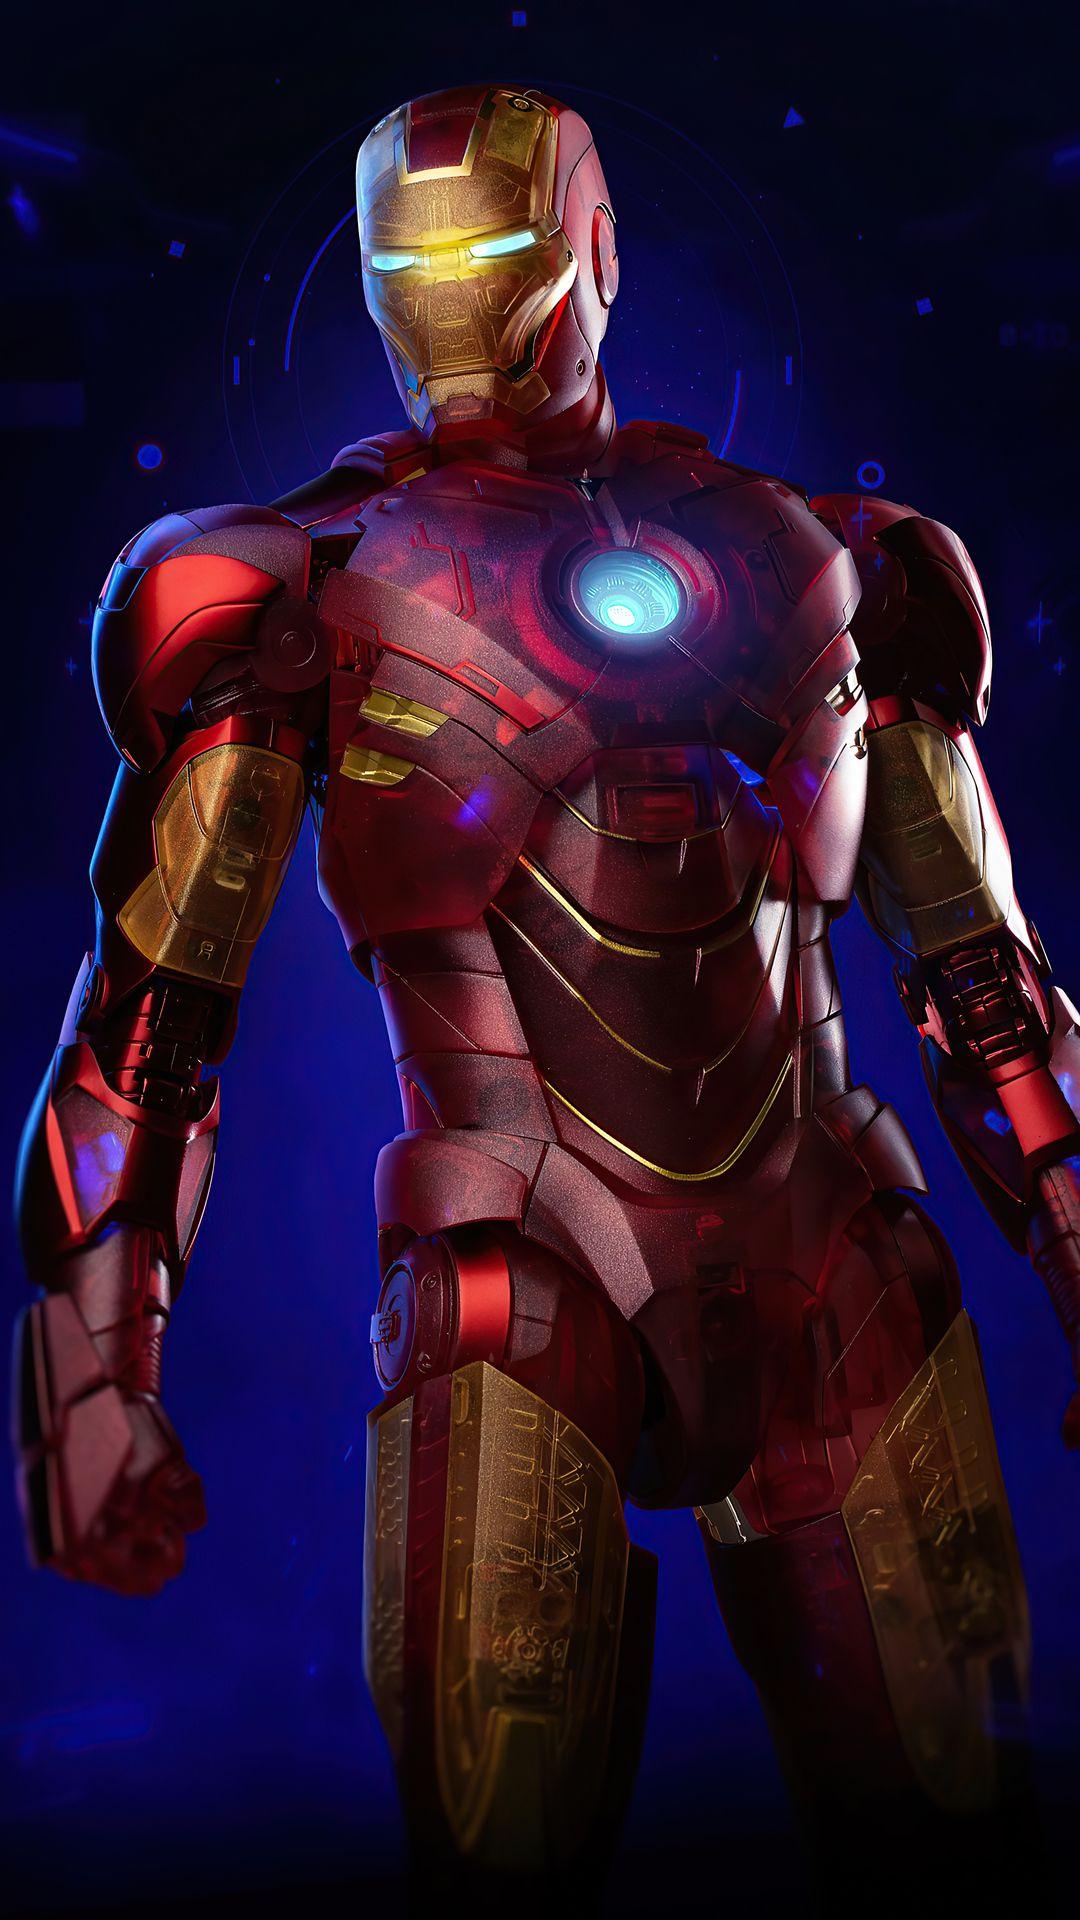 4k Iron Man Holographic In 1080x1920 Resolution Iron Man Hd Wallpaper Iron Man Iron Man Armor Trends for wallpaper iron man 3 suit